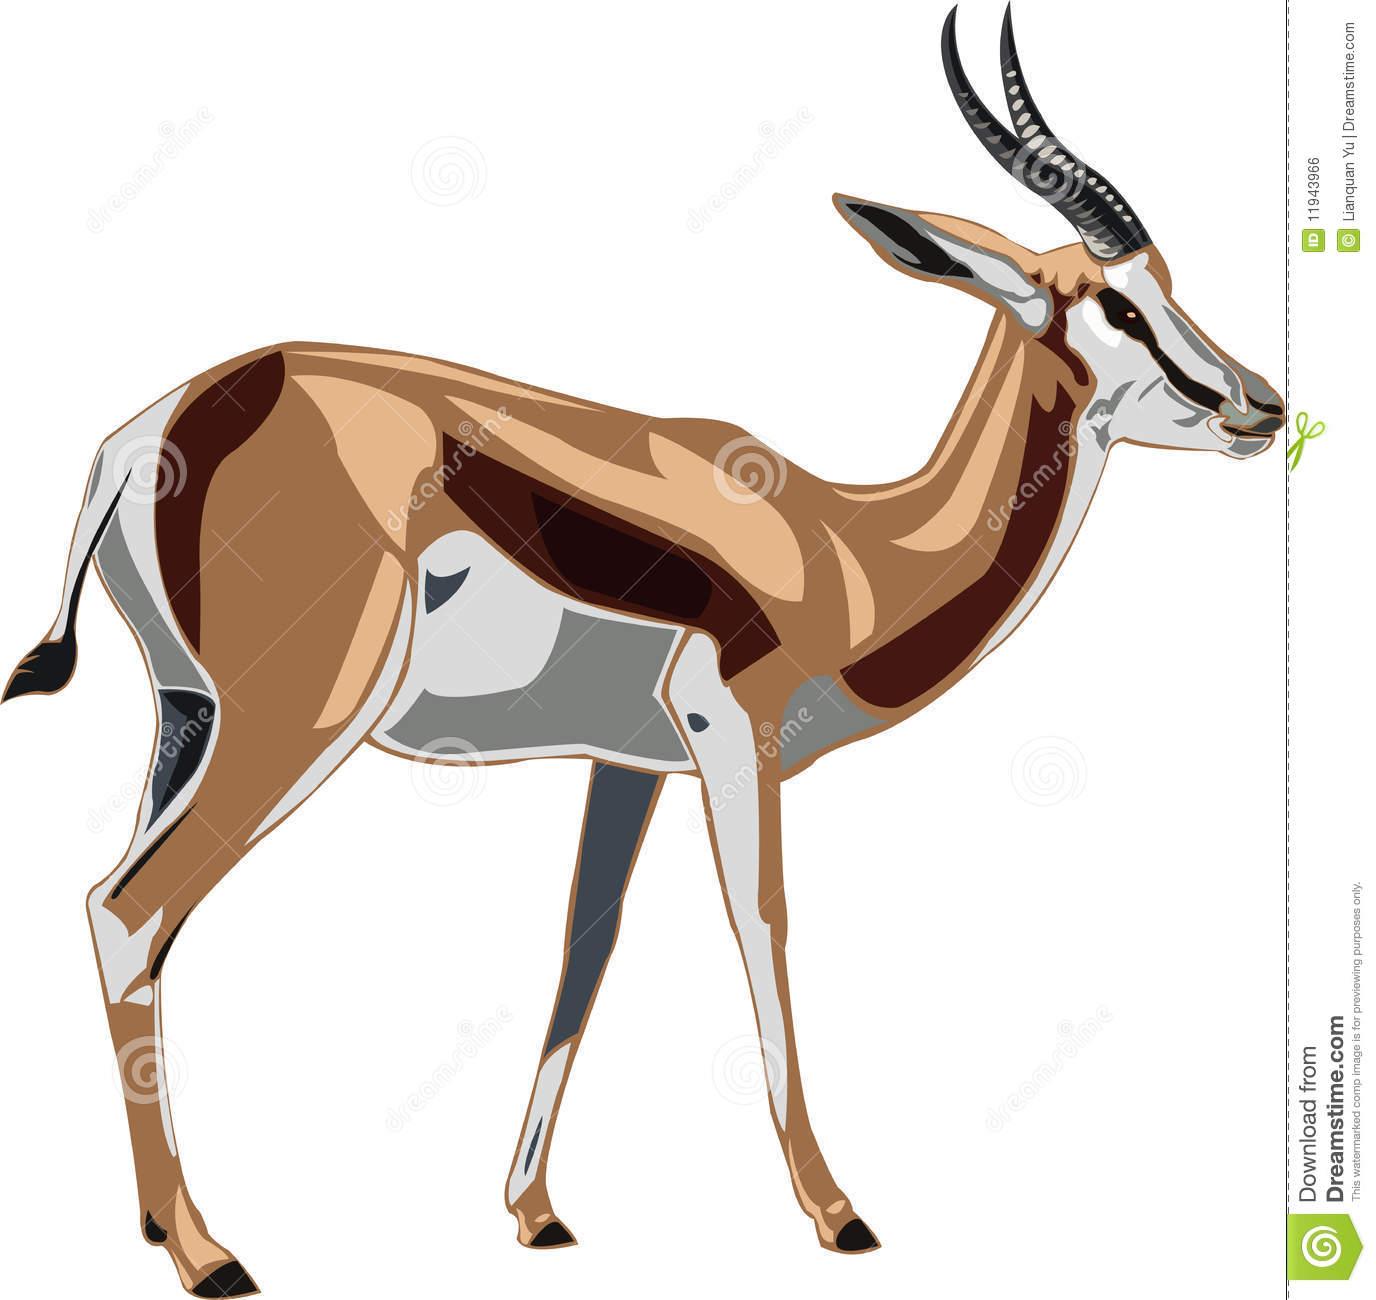 Oryx antelope clipart #19